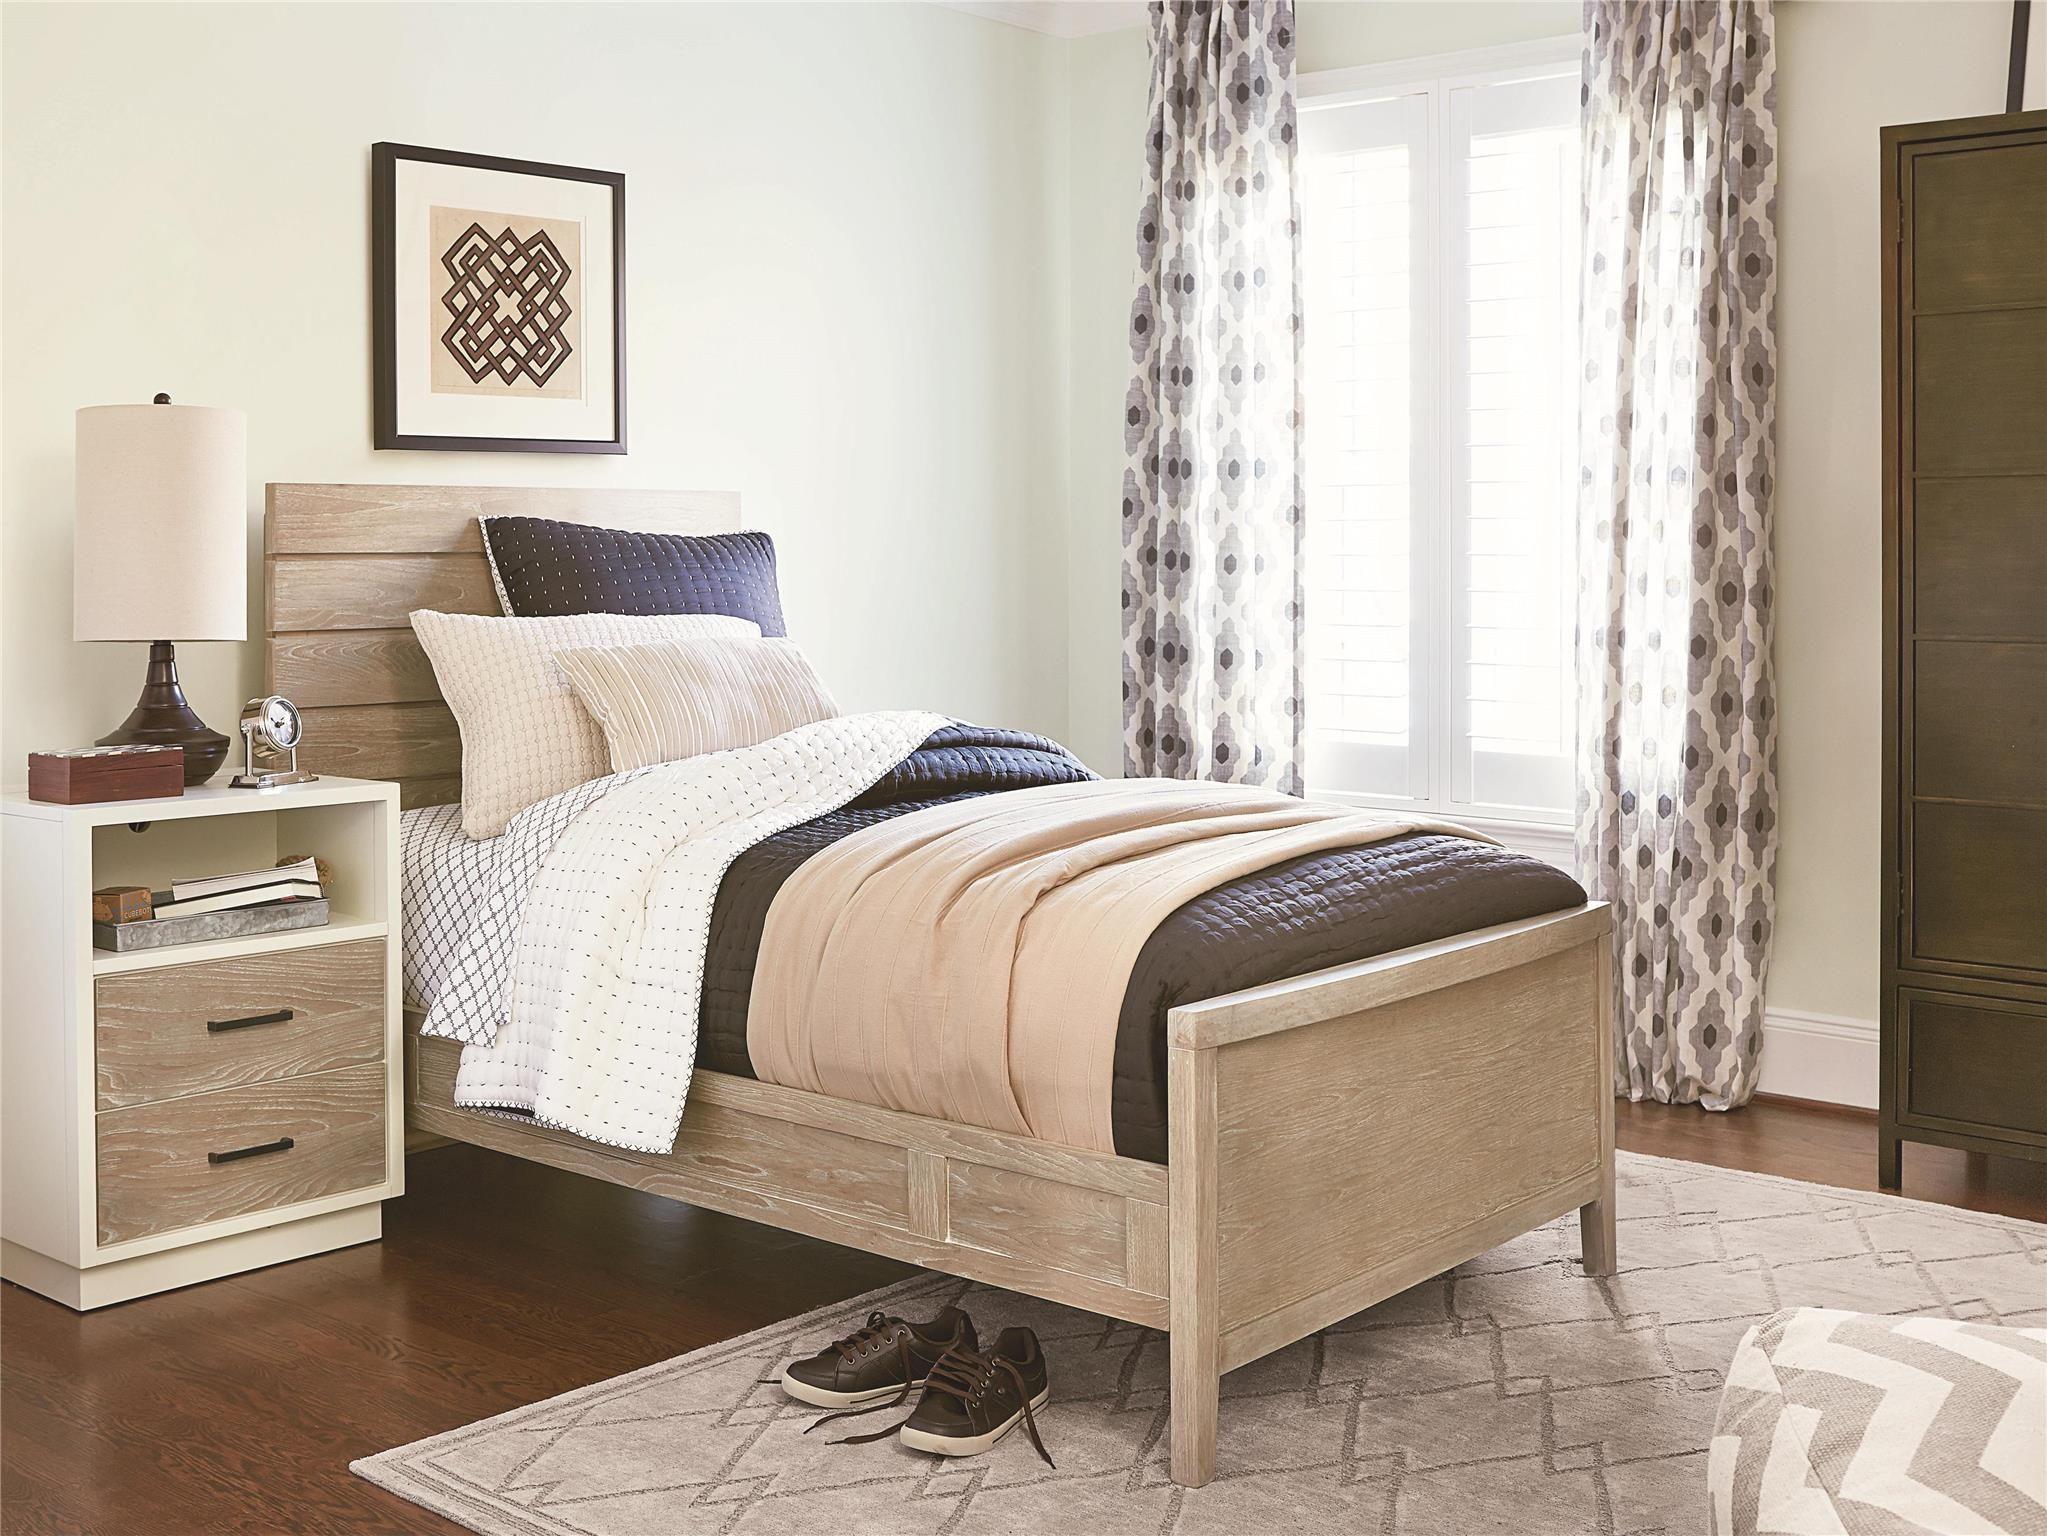 smartstuff Furniture myRoom Nightstand Furniture